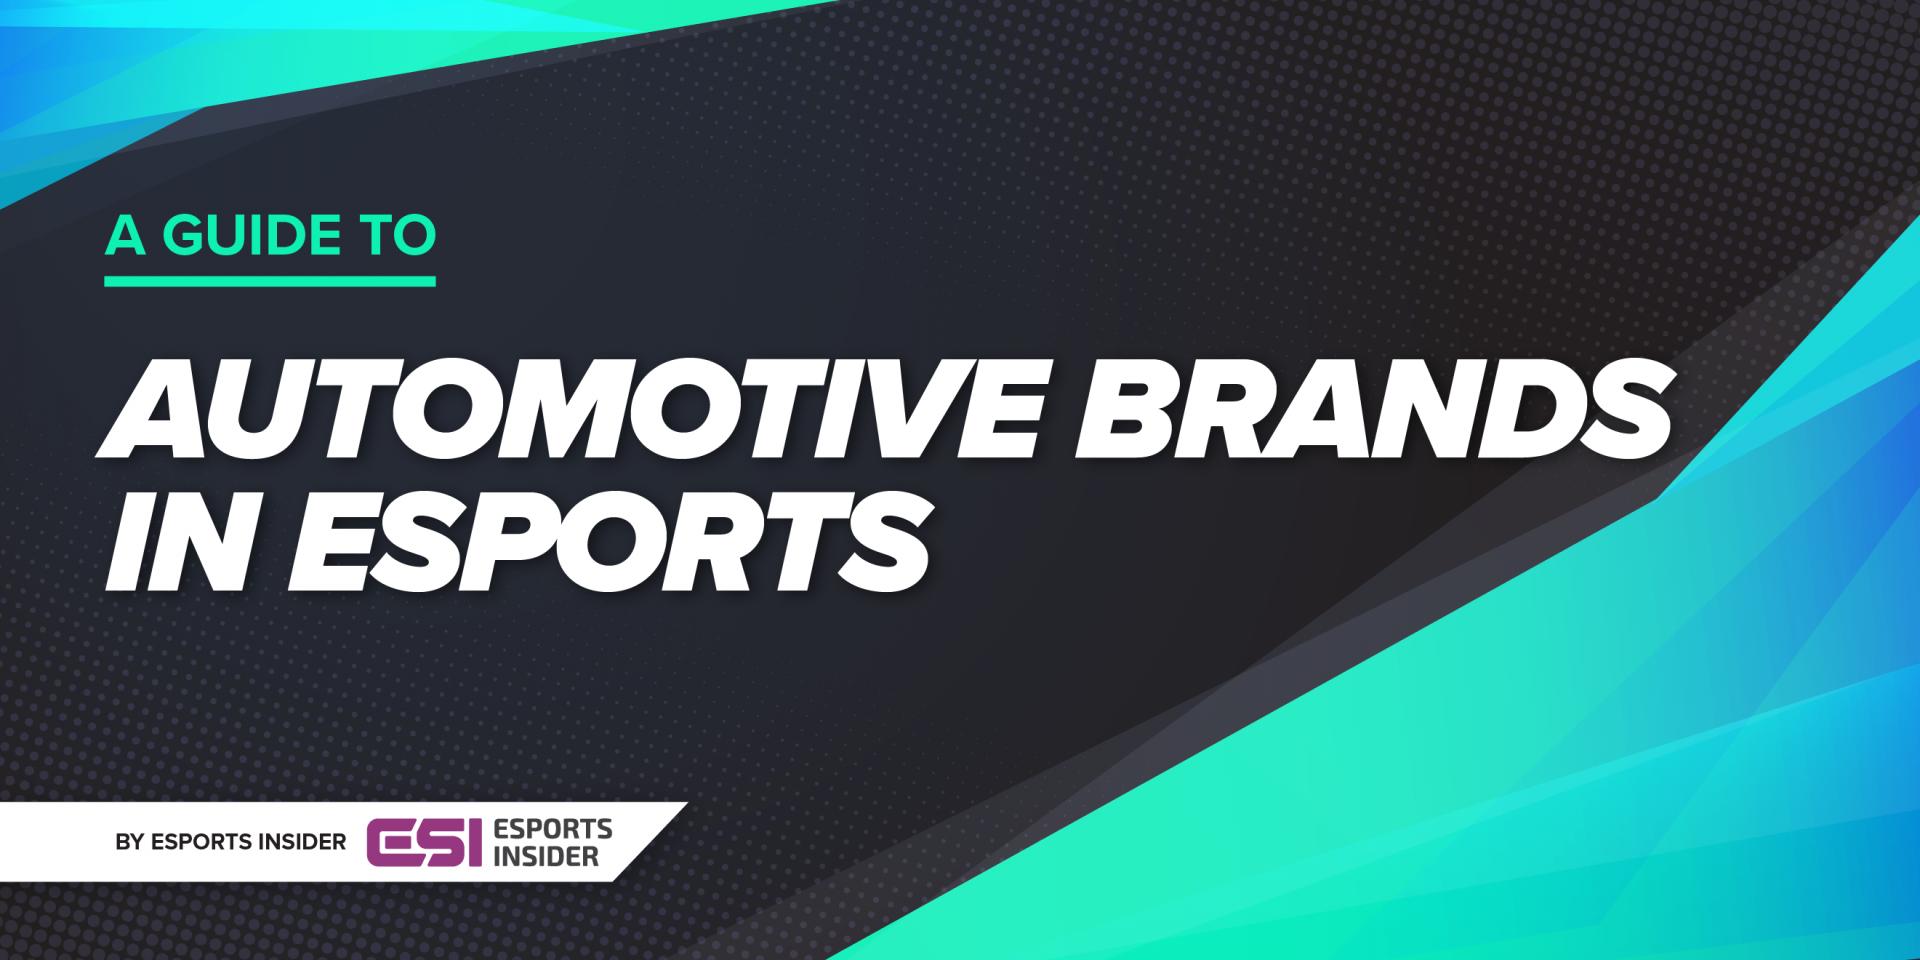 Automotive brands in esports